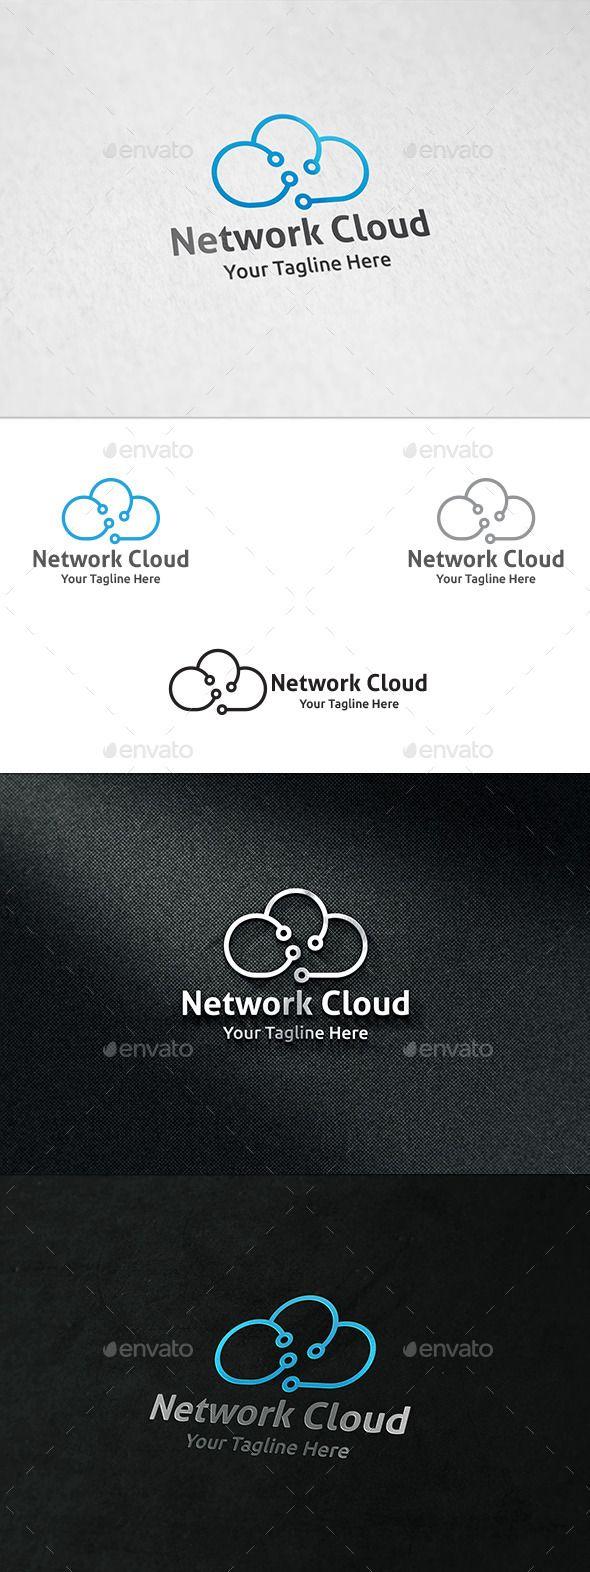 Network Cloud - Logo Template 심플함 파란색 클라우드 선....?